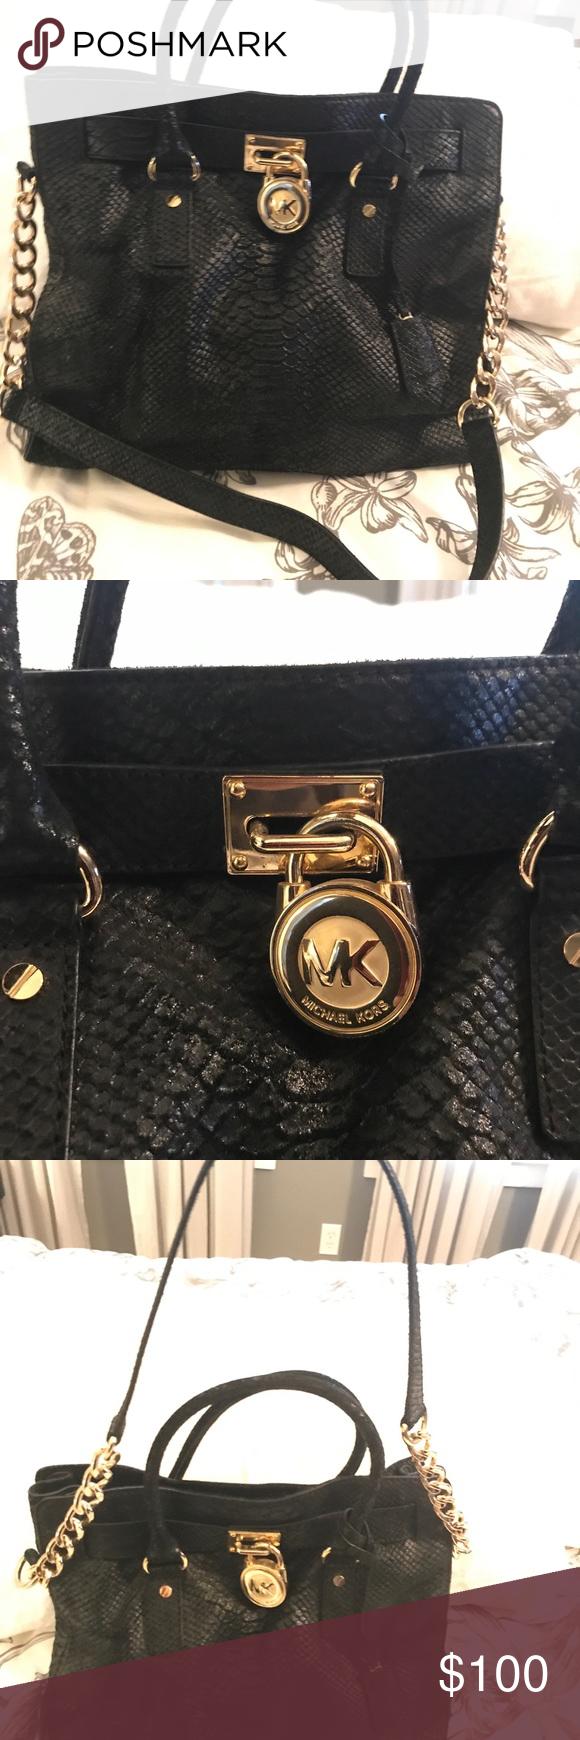 5f12ef9421bd Michael Kors black snake print classic handbag. This bag looks good with  everything! It's a vintage Michael Kors, good condition .